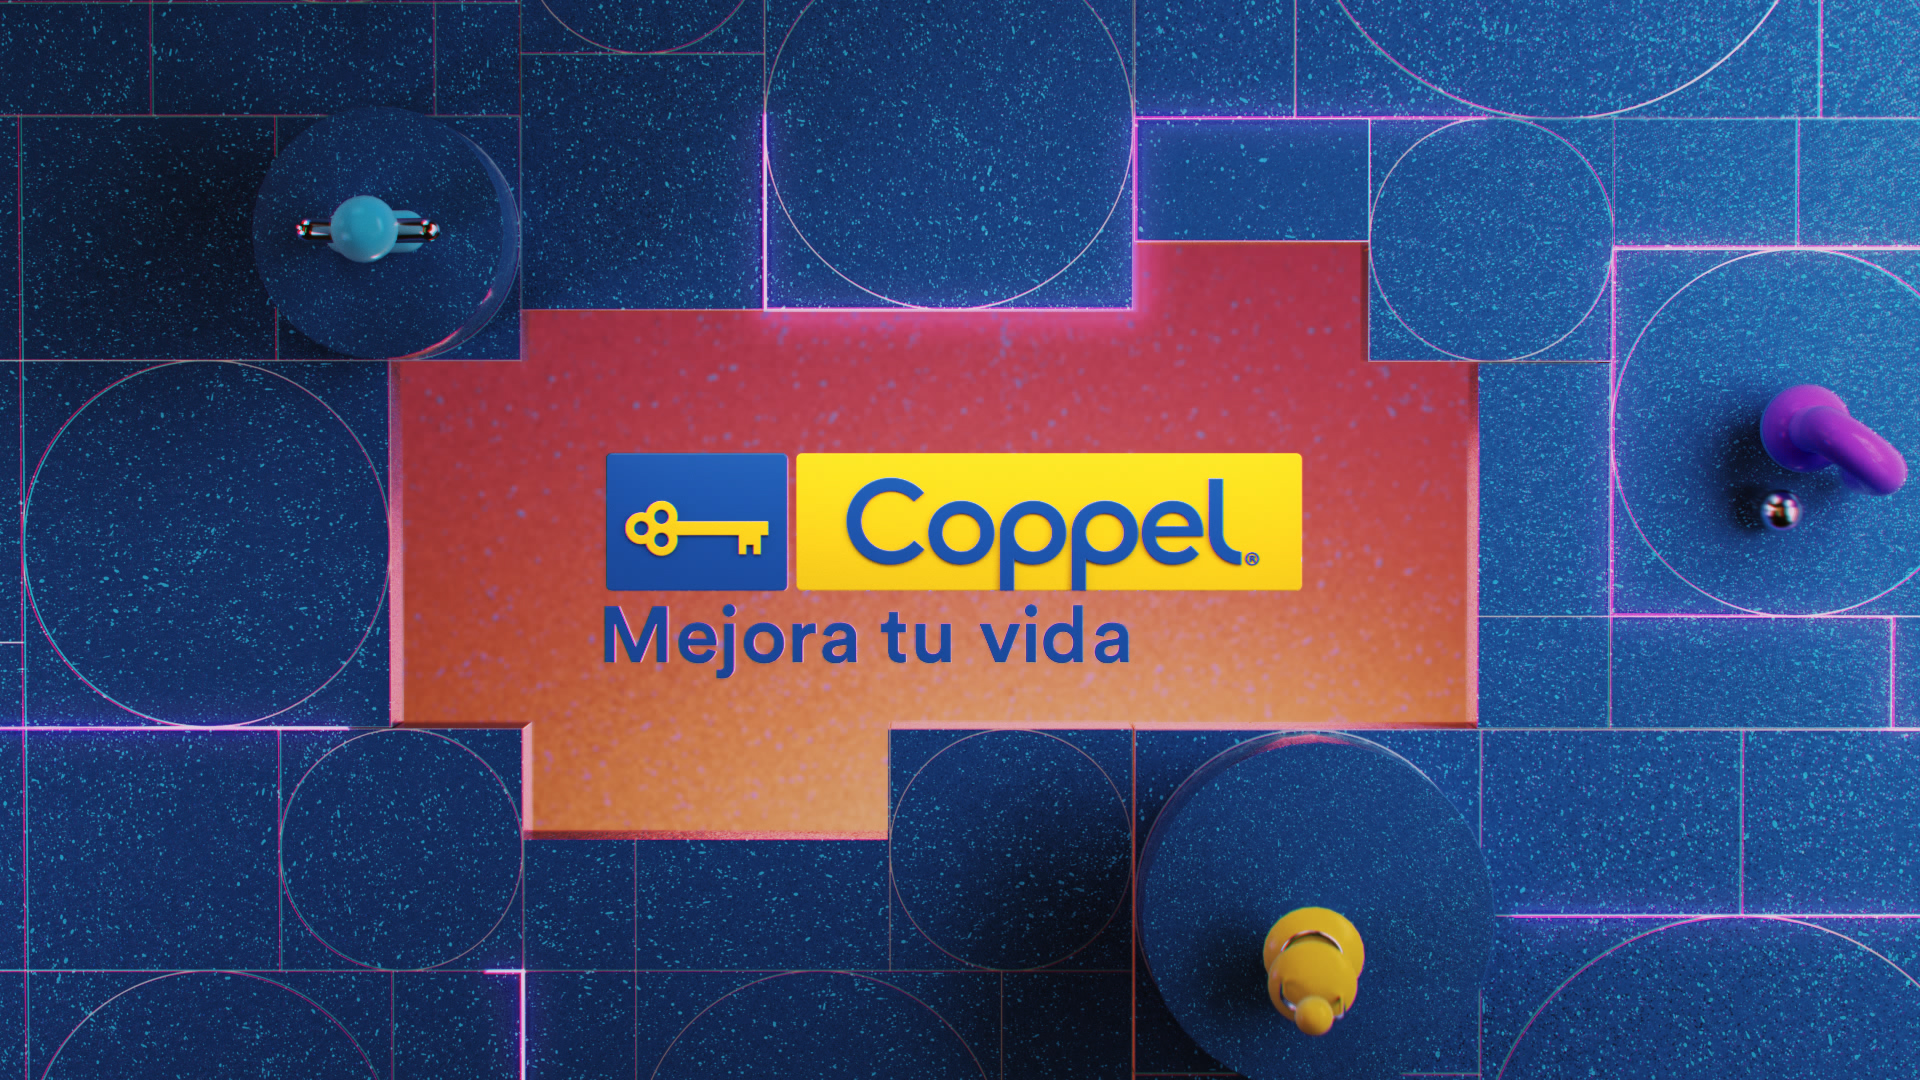 COPPEL_CELULARES_SERIE_16-9_20s_ProRes444_4.jpg